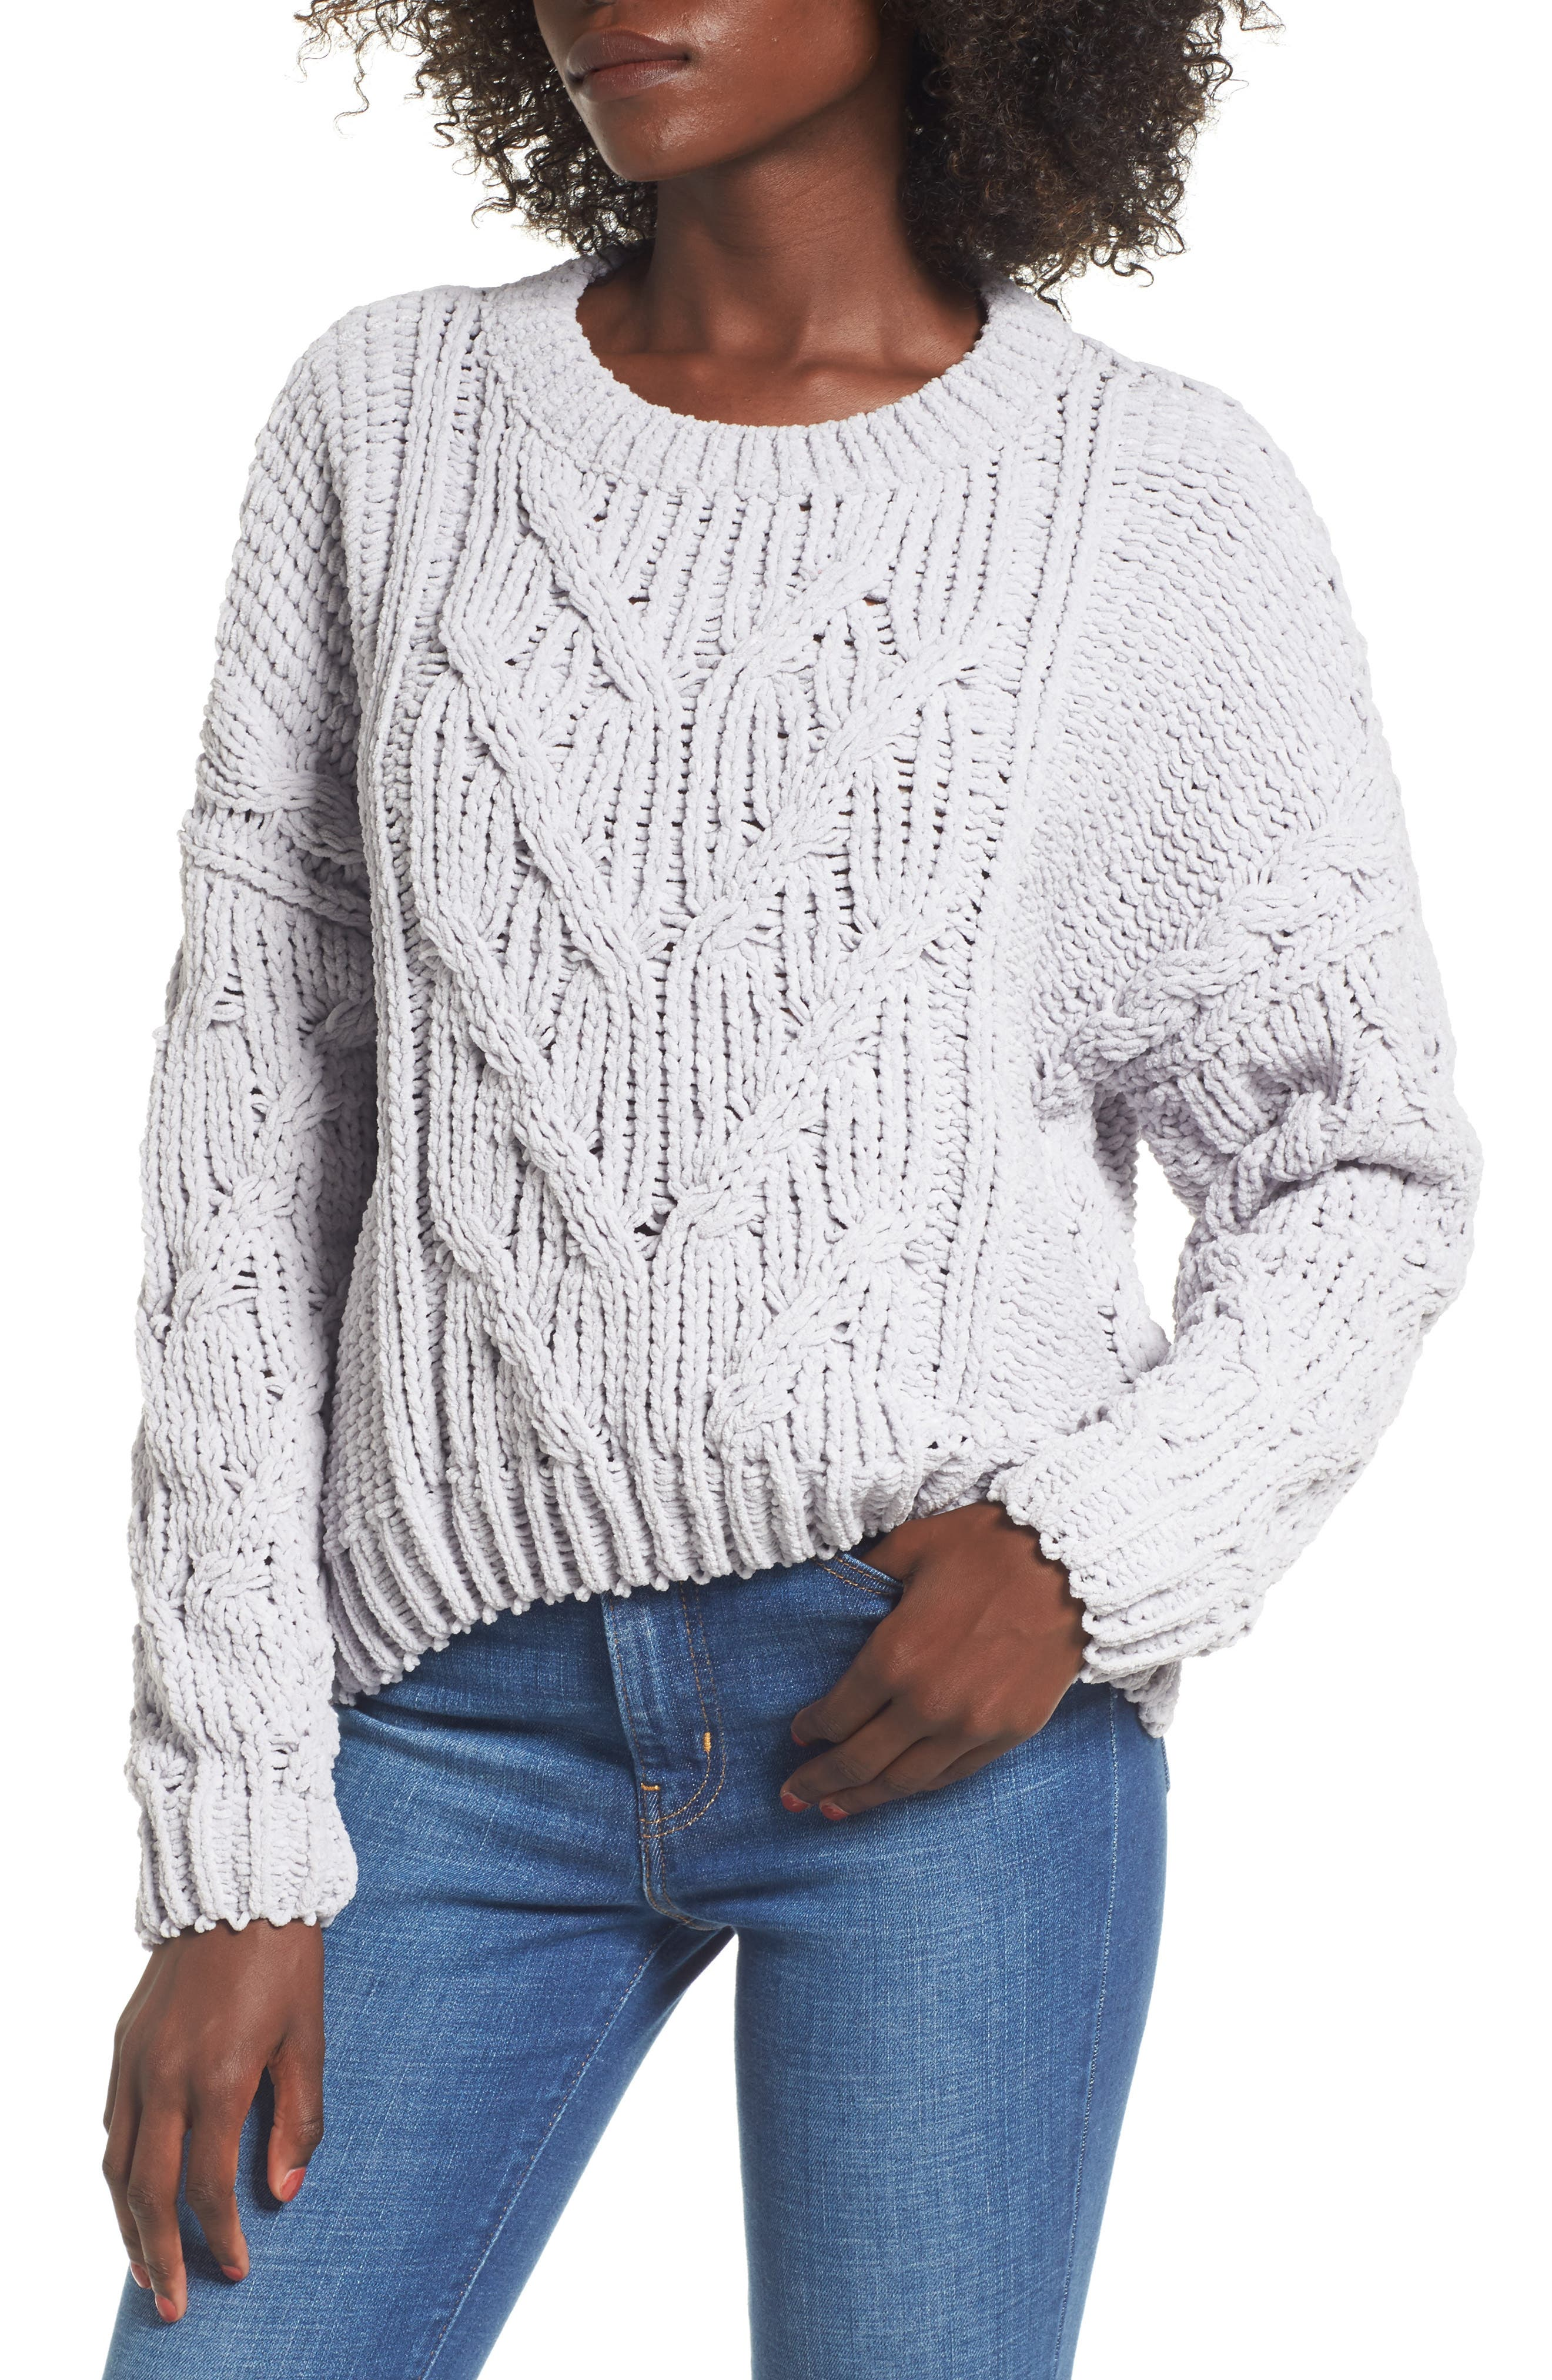 Main Image - J.O.A. Cozy Crewneck Sweater